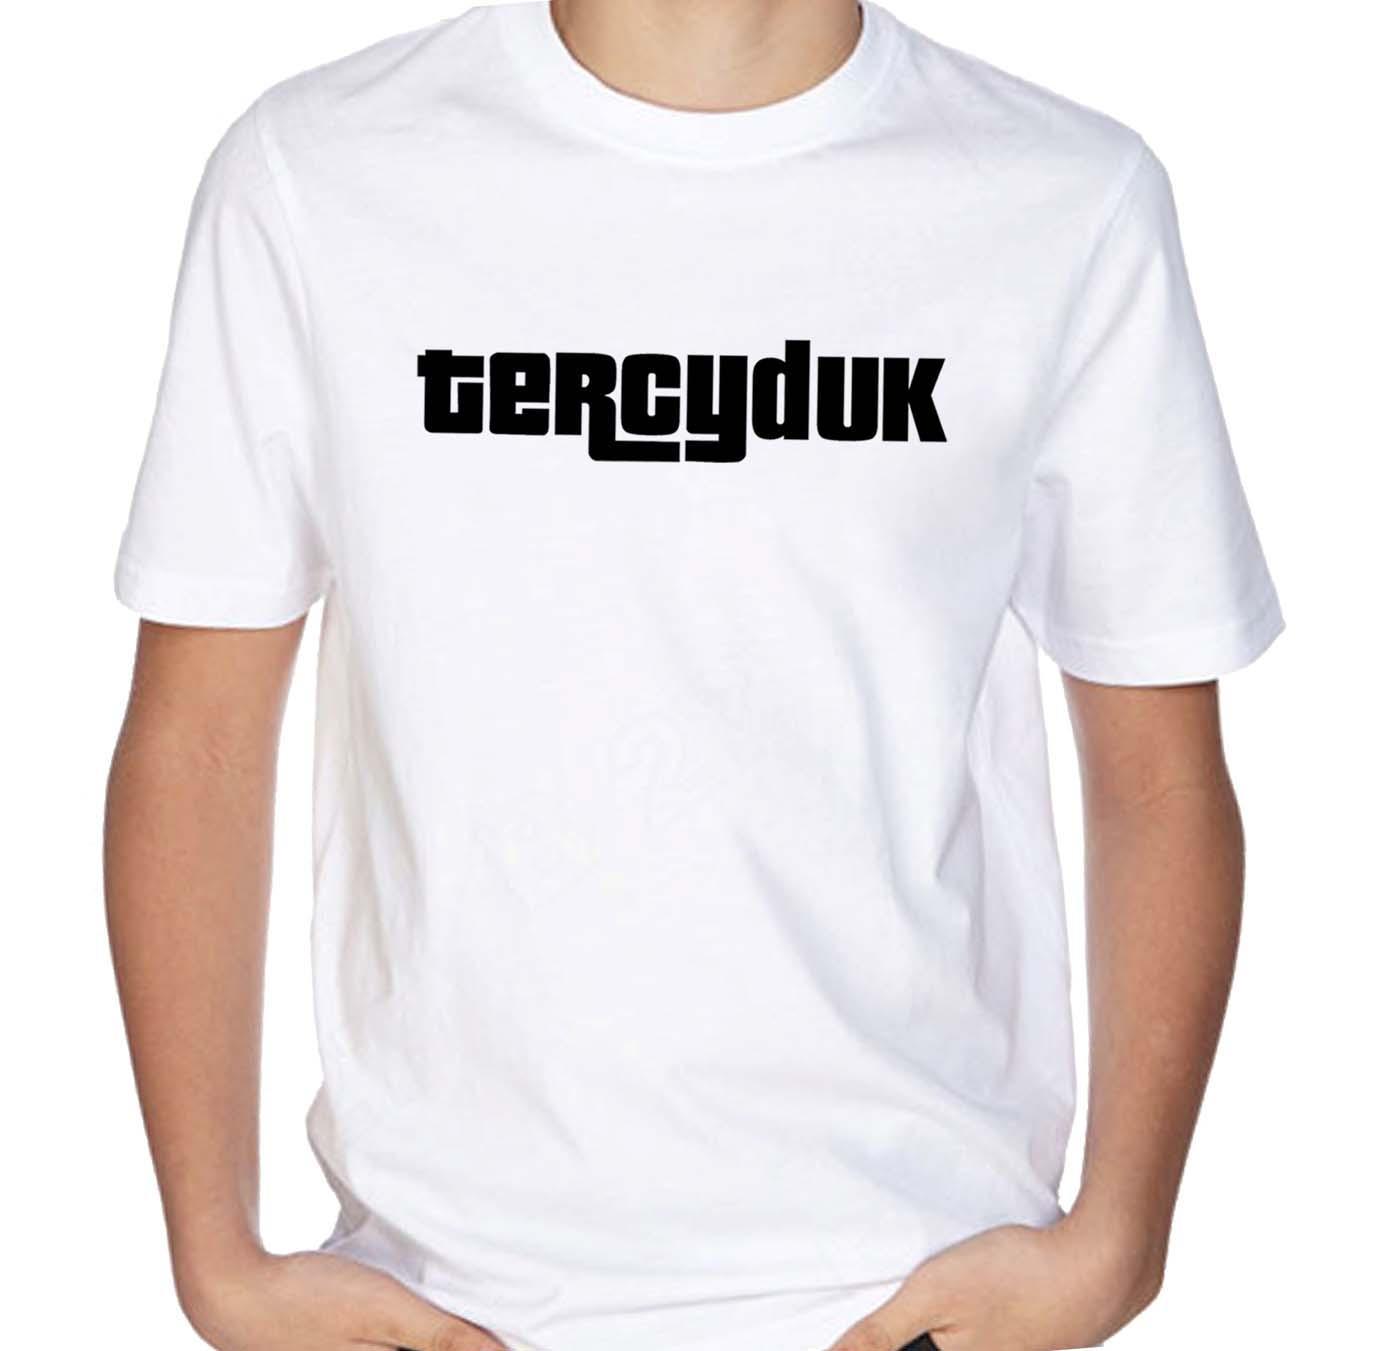 Kaos T-shirt Distro TERCIDUK Pria / Wanita Bahan Catton - White